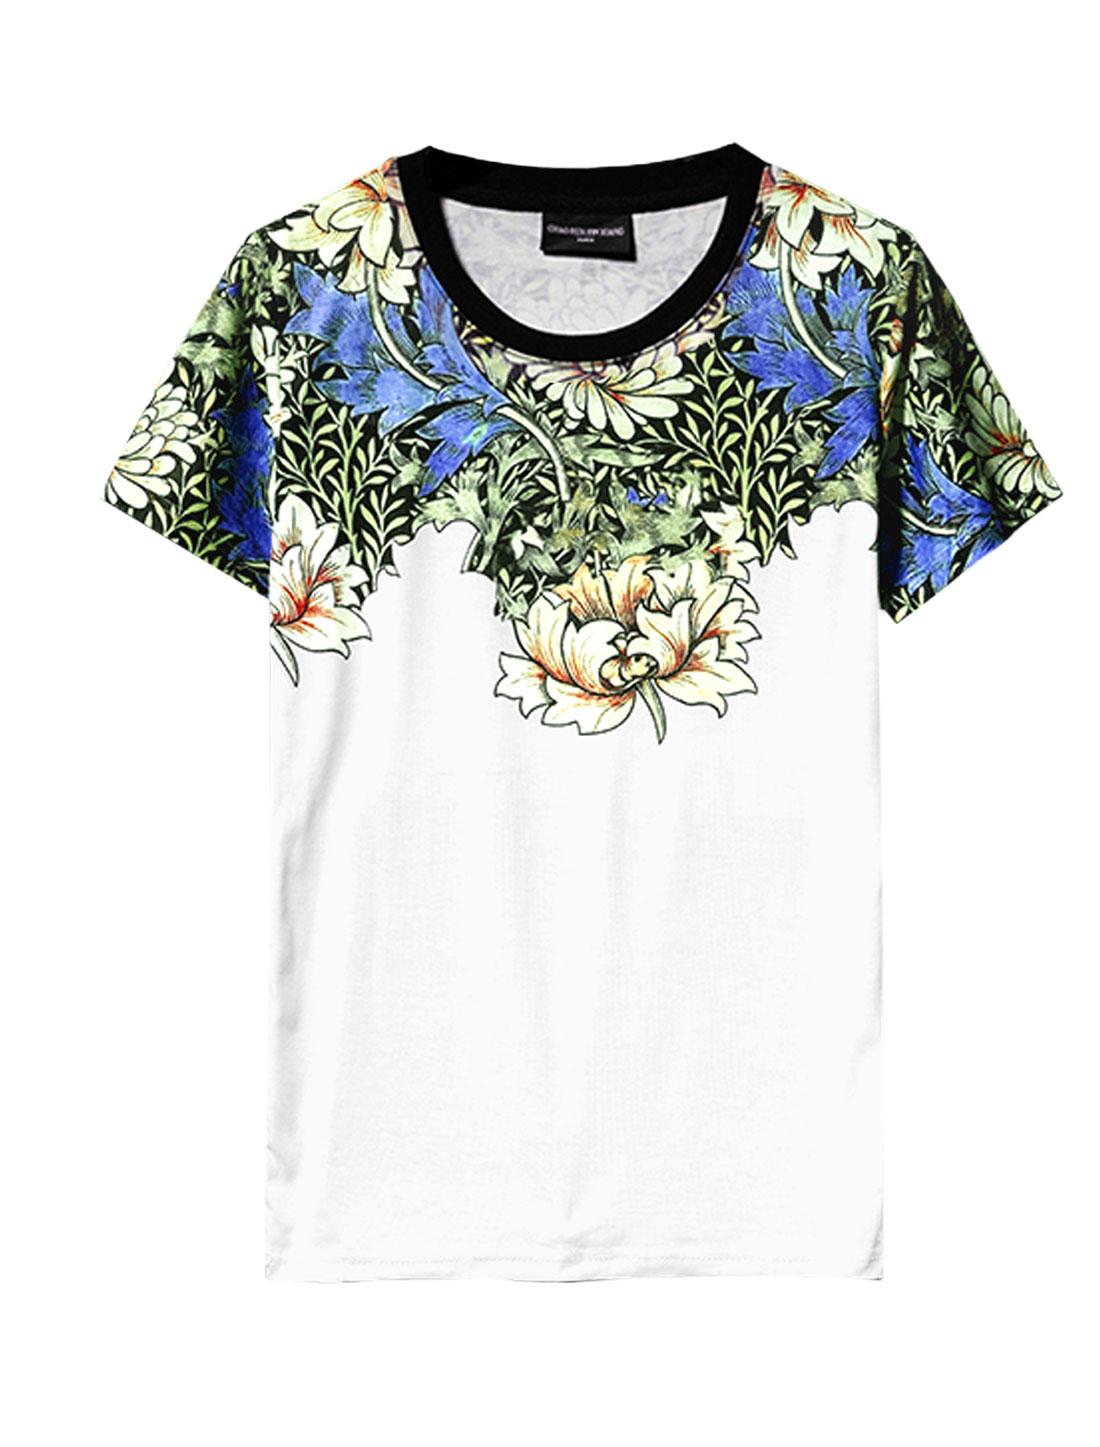 Short Sleeve Floral Prints Soft Trendy T-Shirt for Men White M